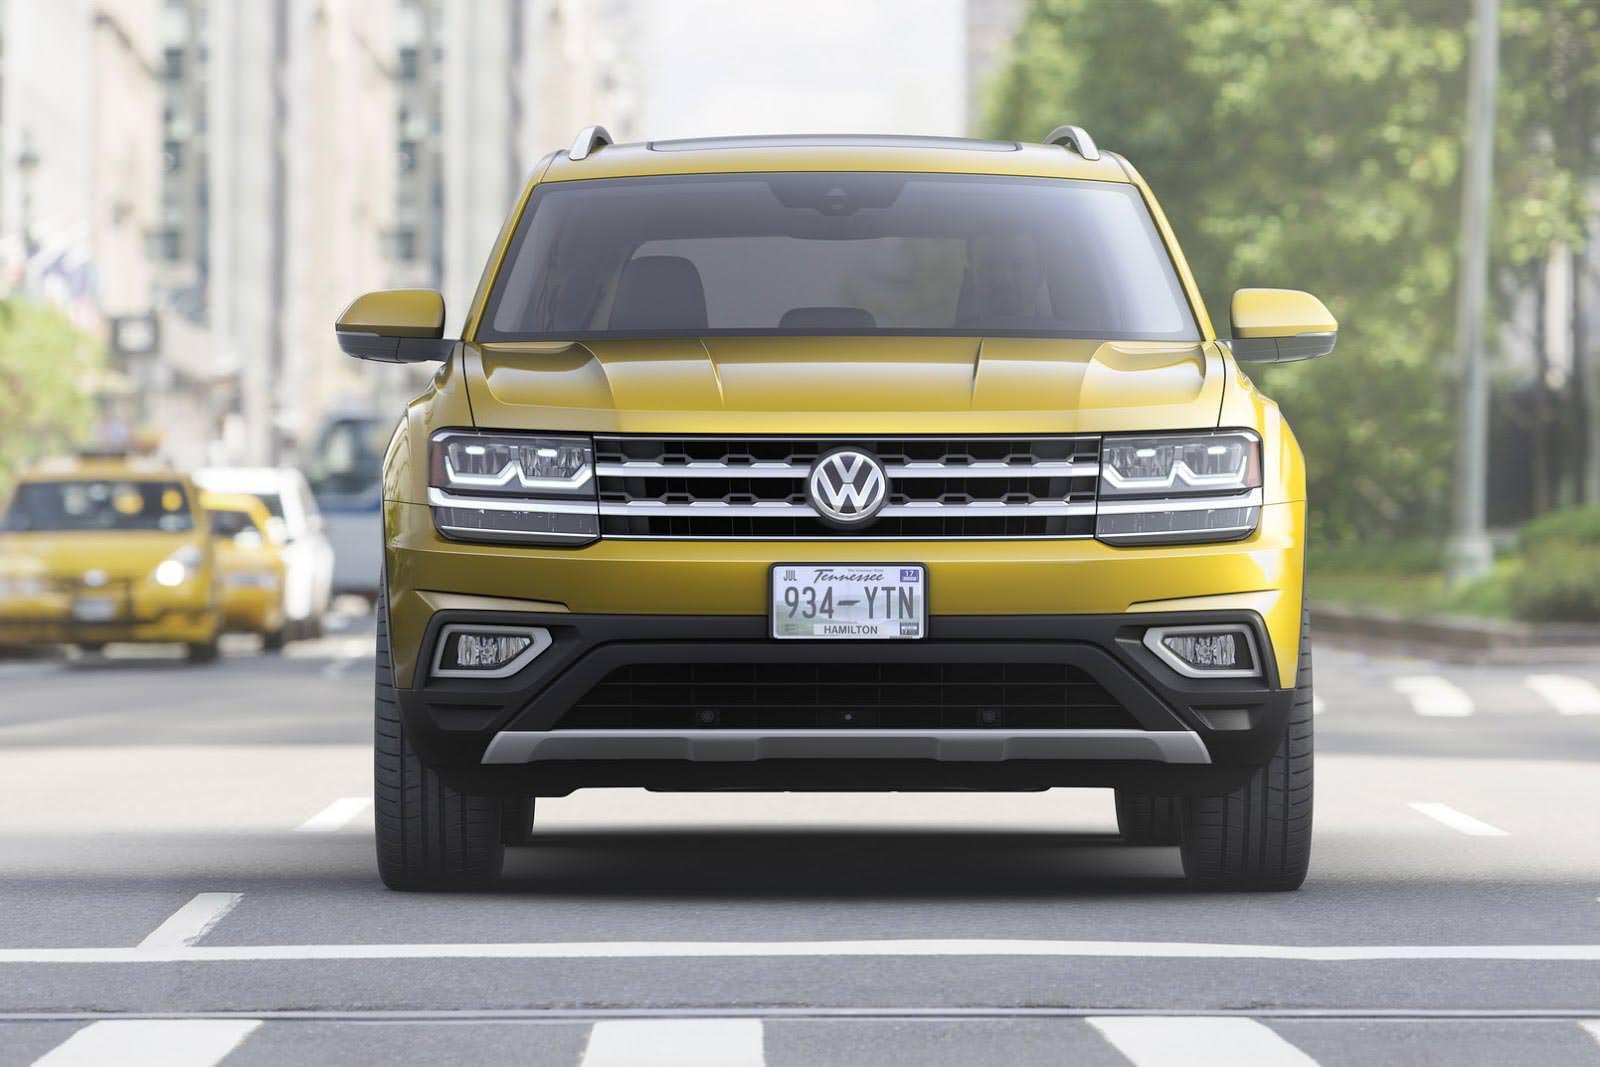 Кроссовер Volkswagen Atlas. Вид спереди